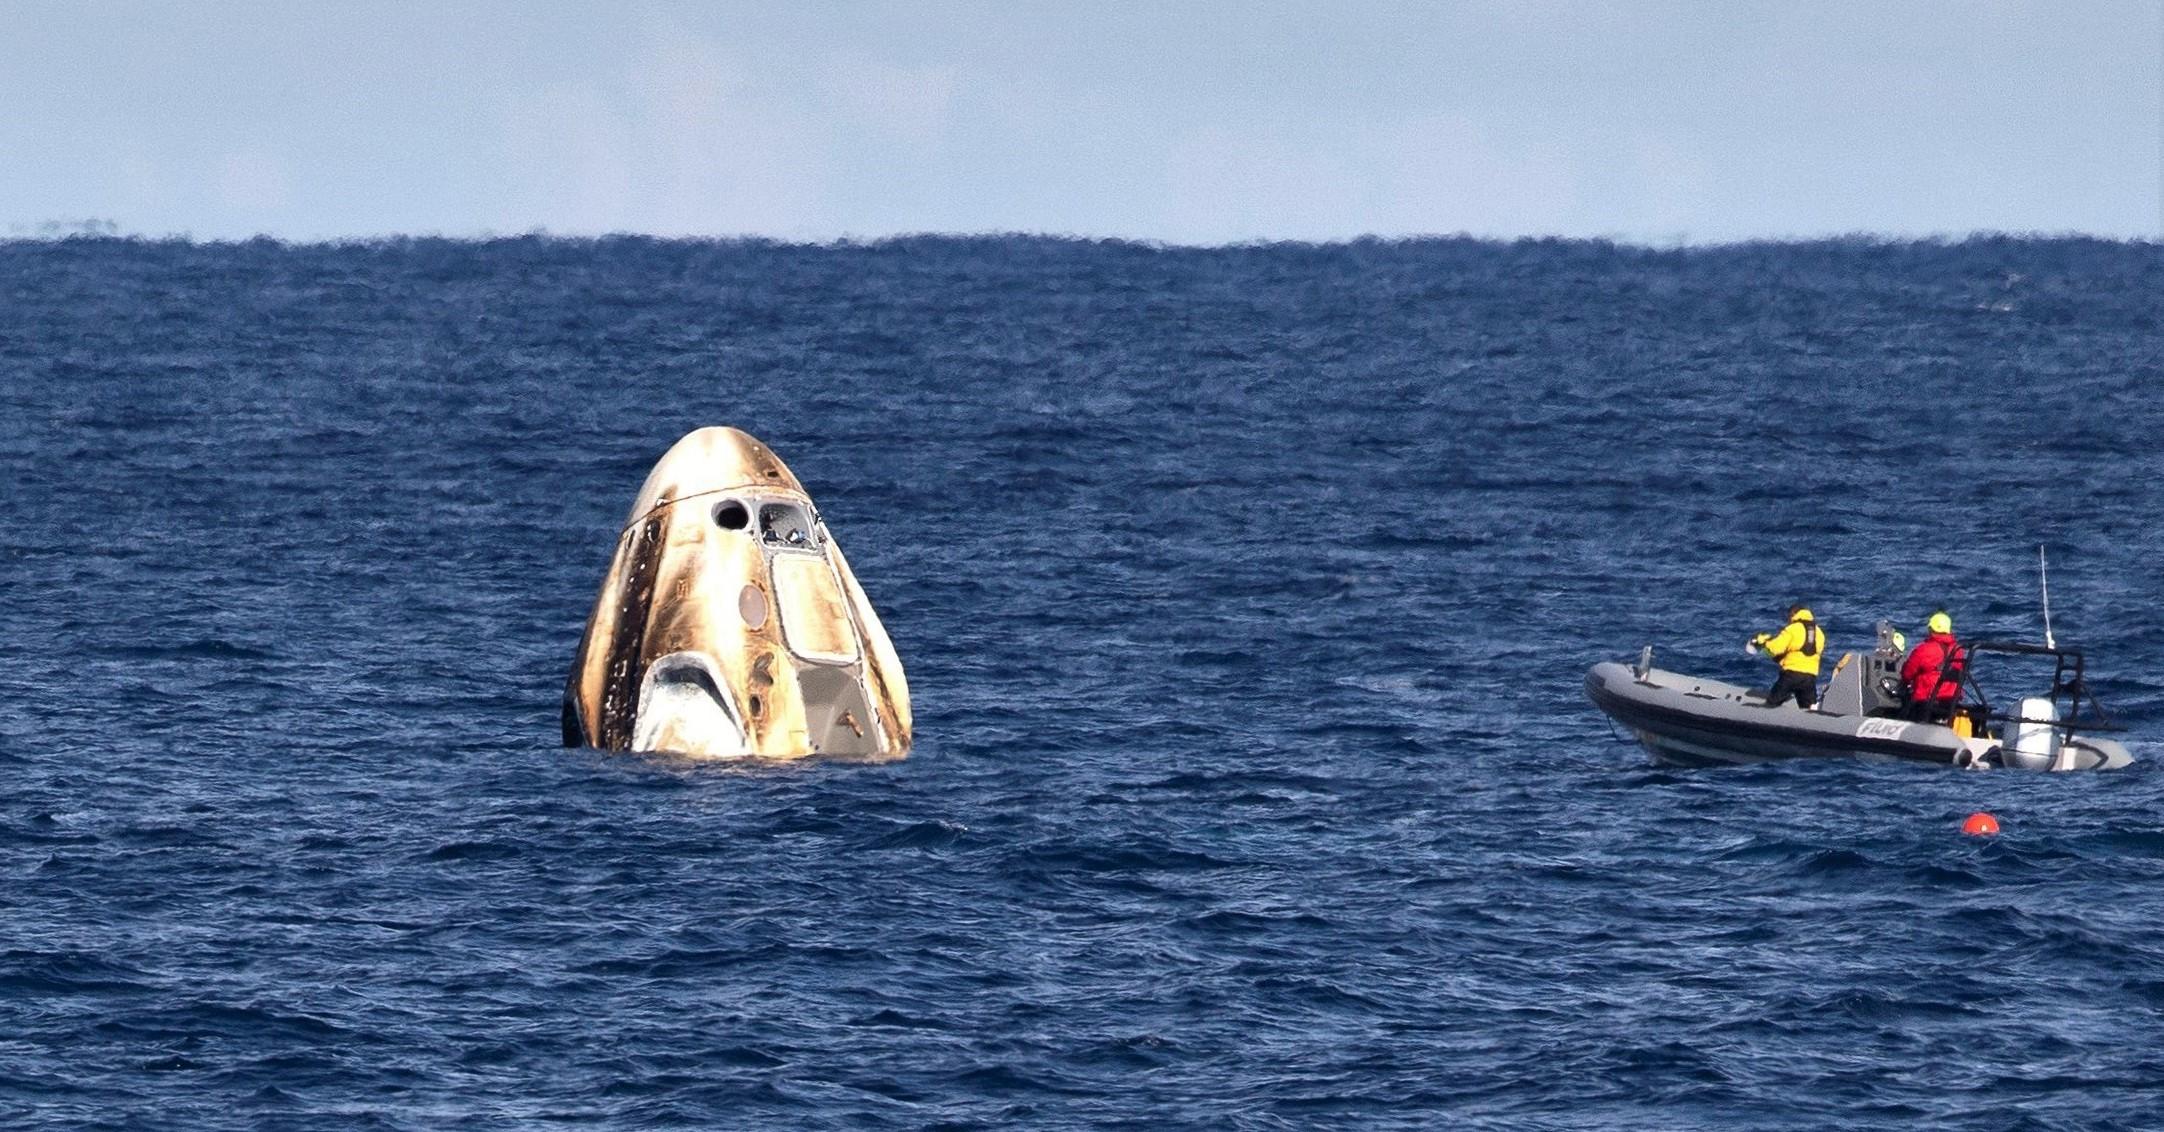 Crew Dragon DM-1 parachute splashdown 030819 (NASA) 7 crop